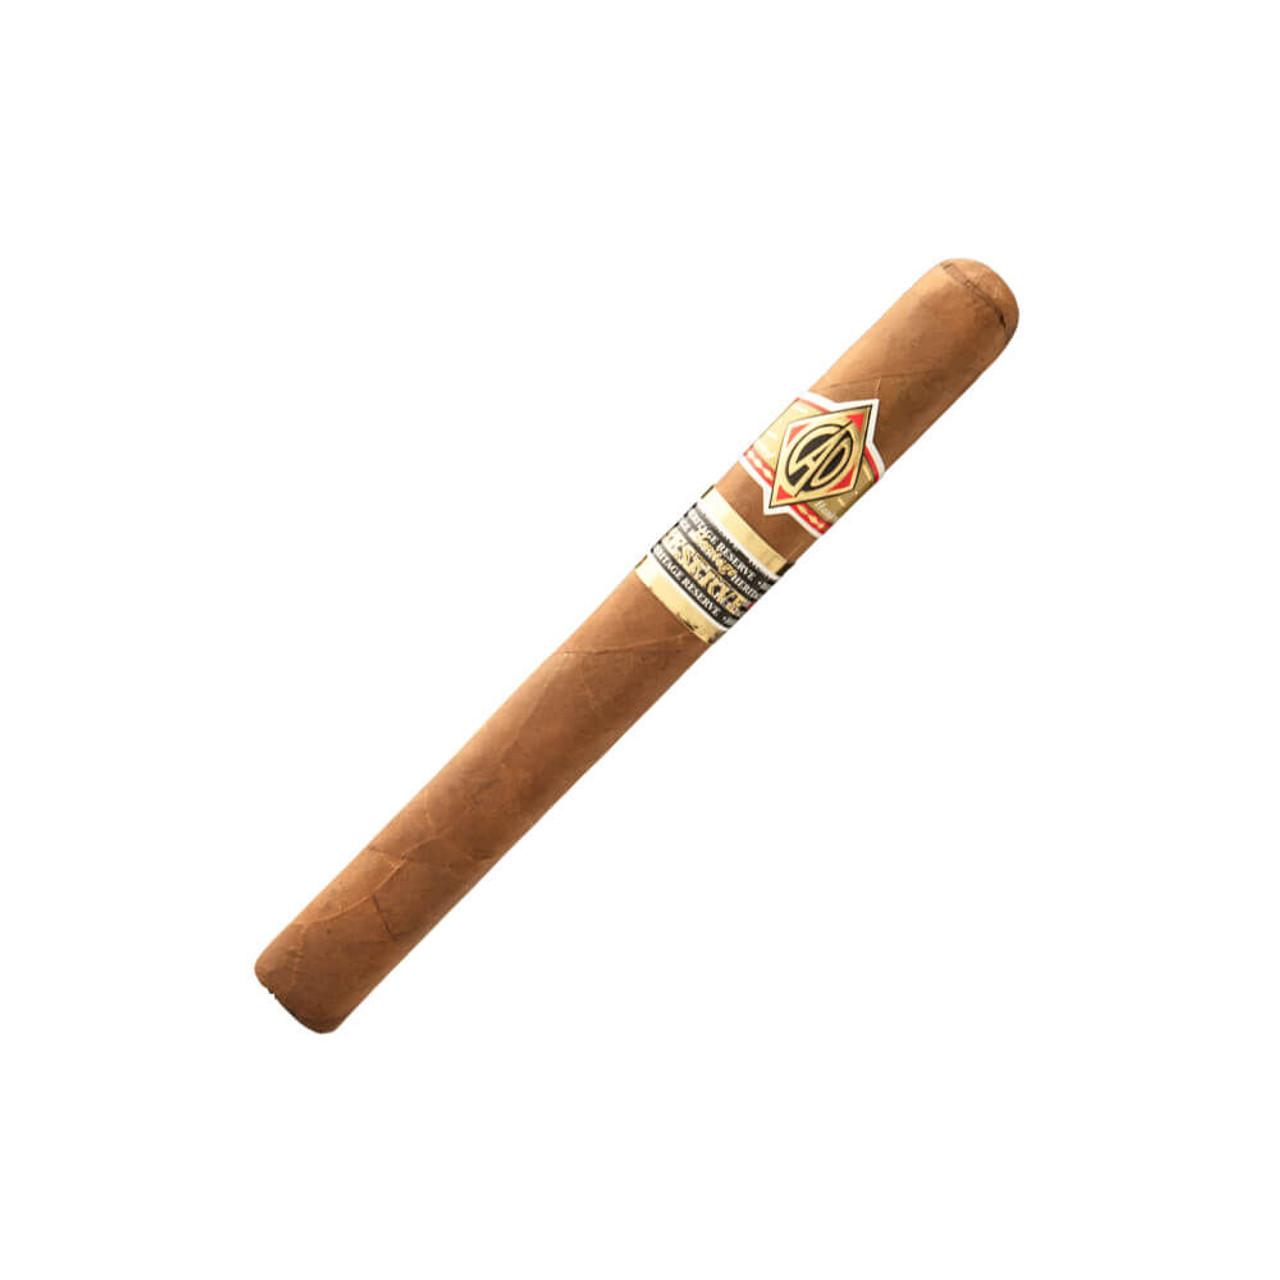 CAO Heritage Reserve Double Corona Cigars - 6.75 x 47 (Box of 18)